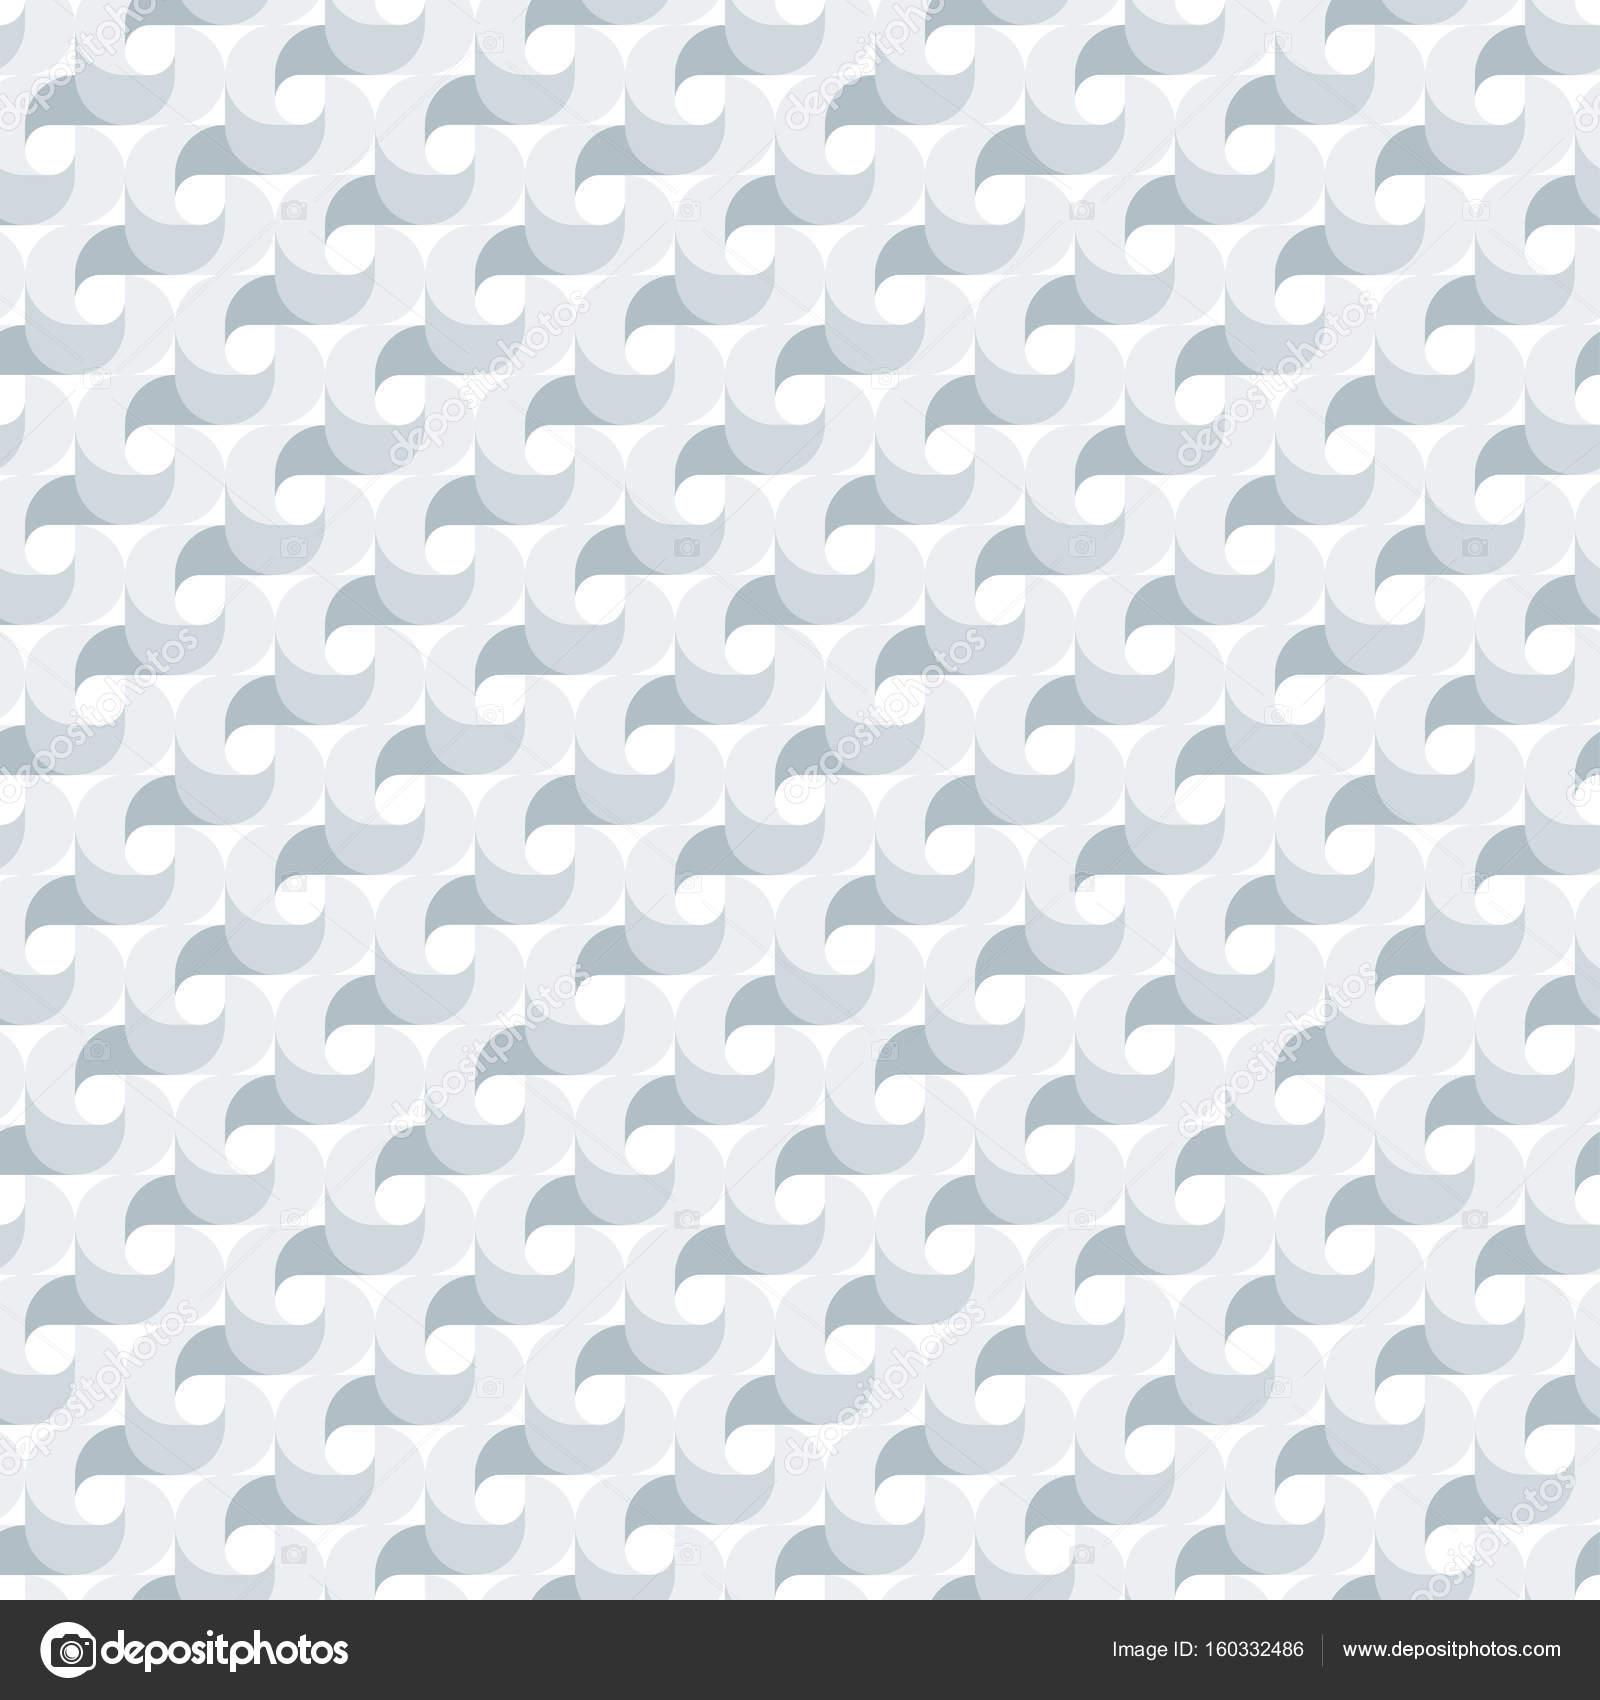 reguläre radiale Geometrien — Stockvektor © uzhveko #160332486